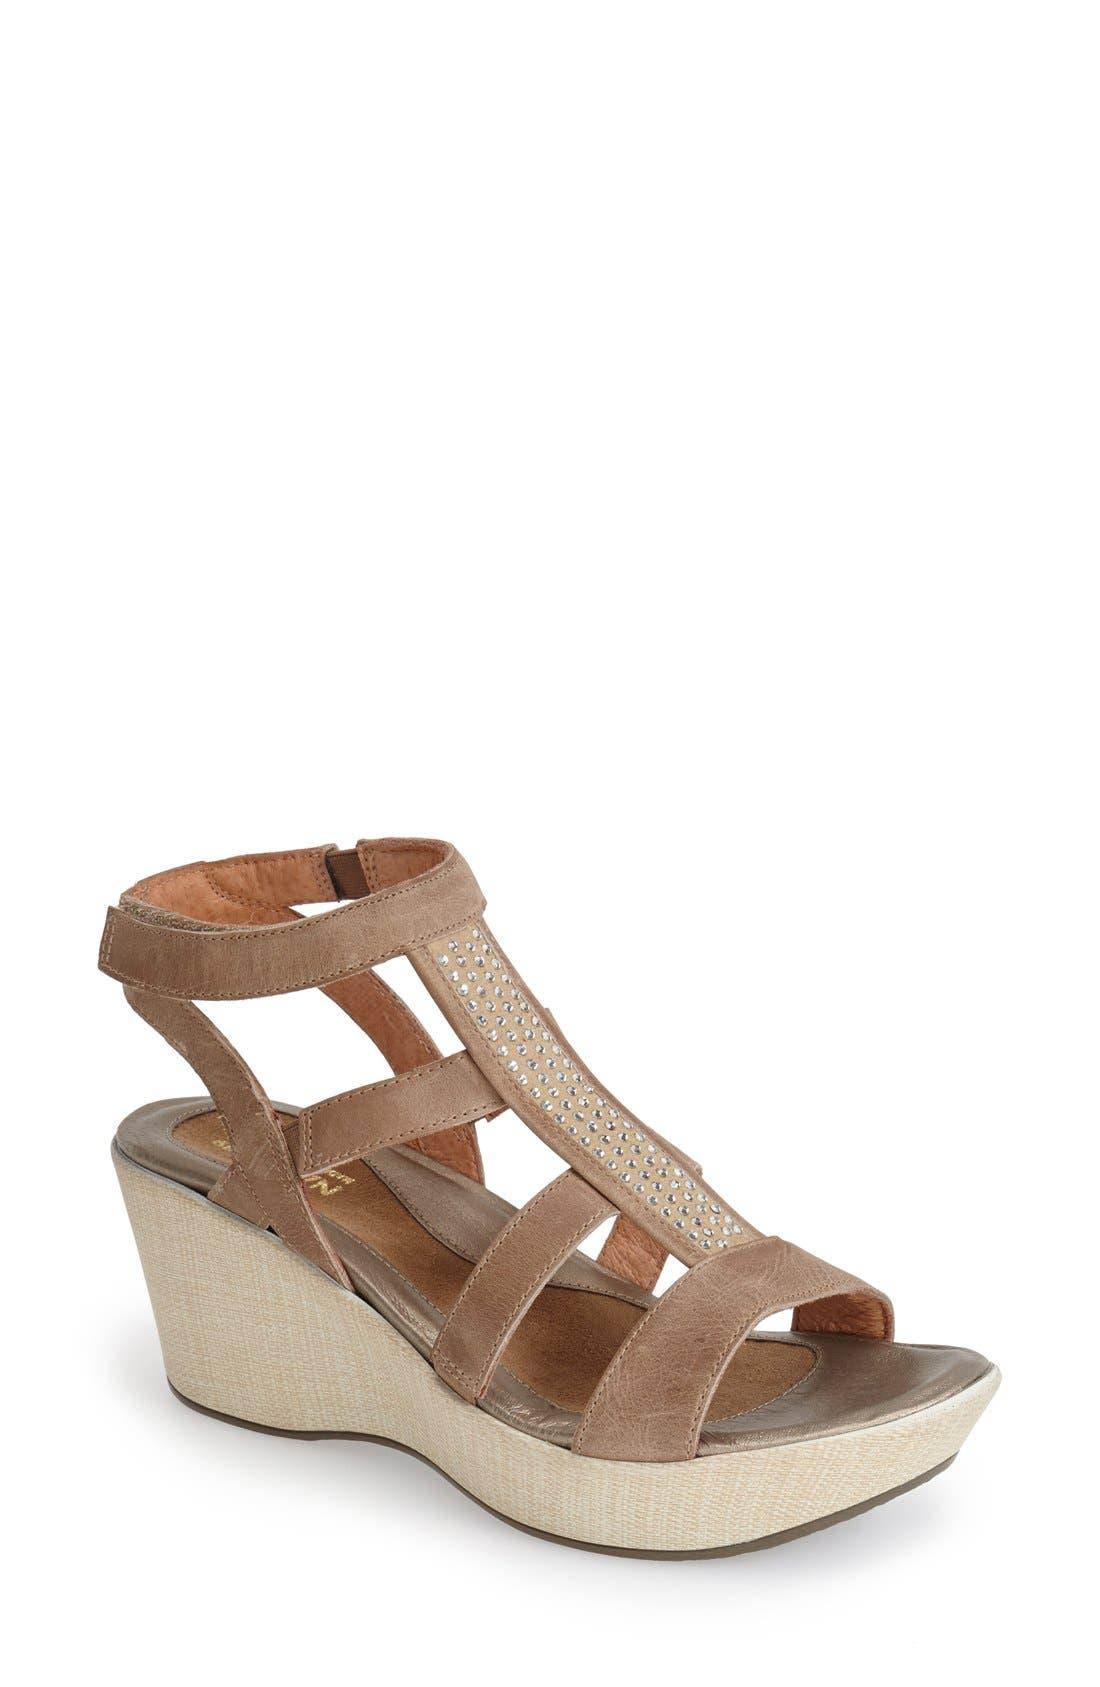 Main Image - Naot 'Mystery' Platform Wedge Sandal (Women)